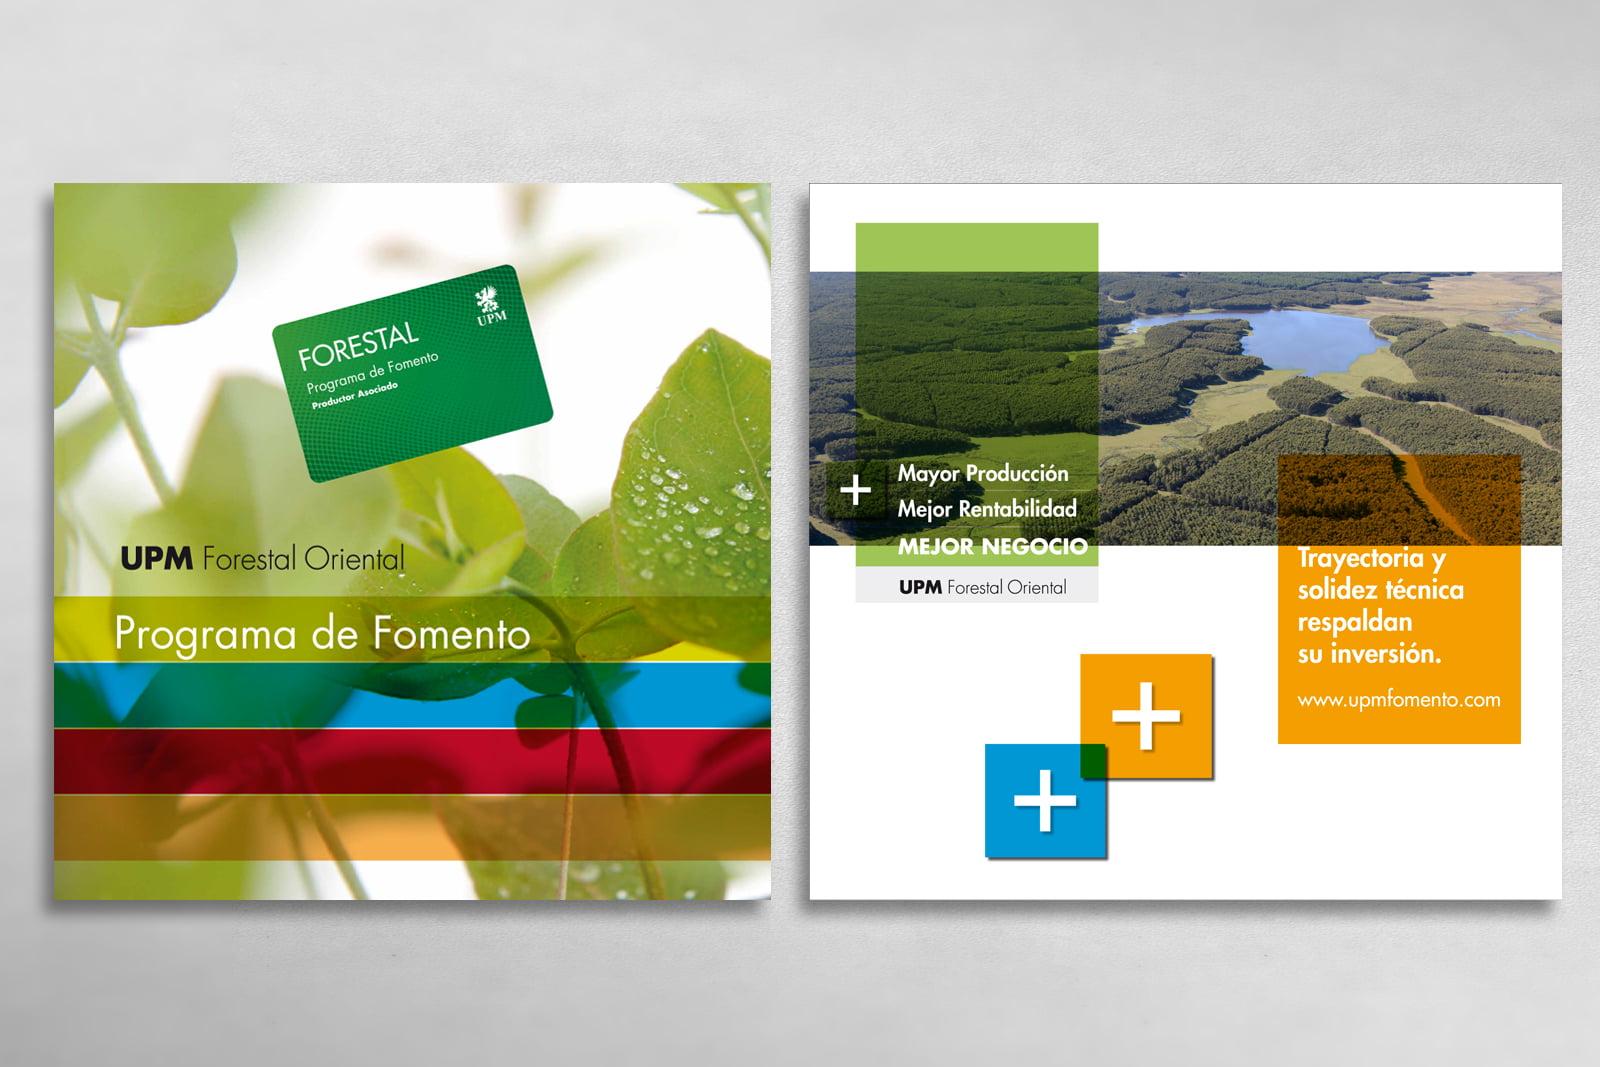 Cliente: UPM Forestal Oriental. Campaña Tarjeta Forestal